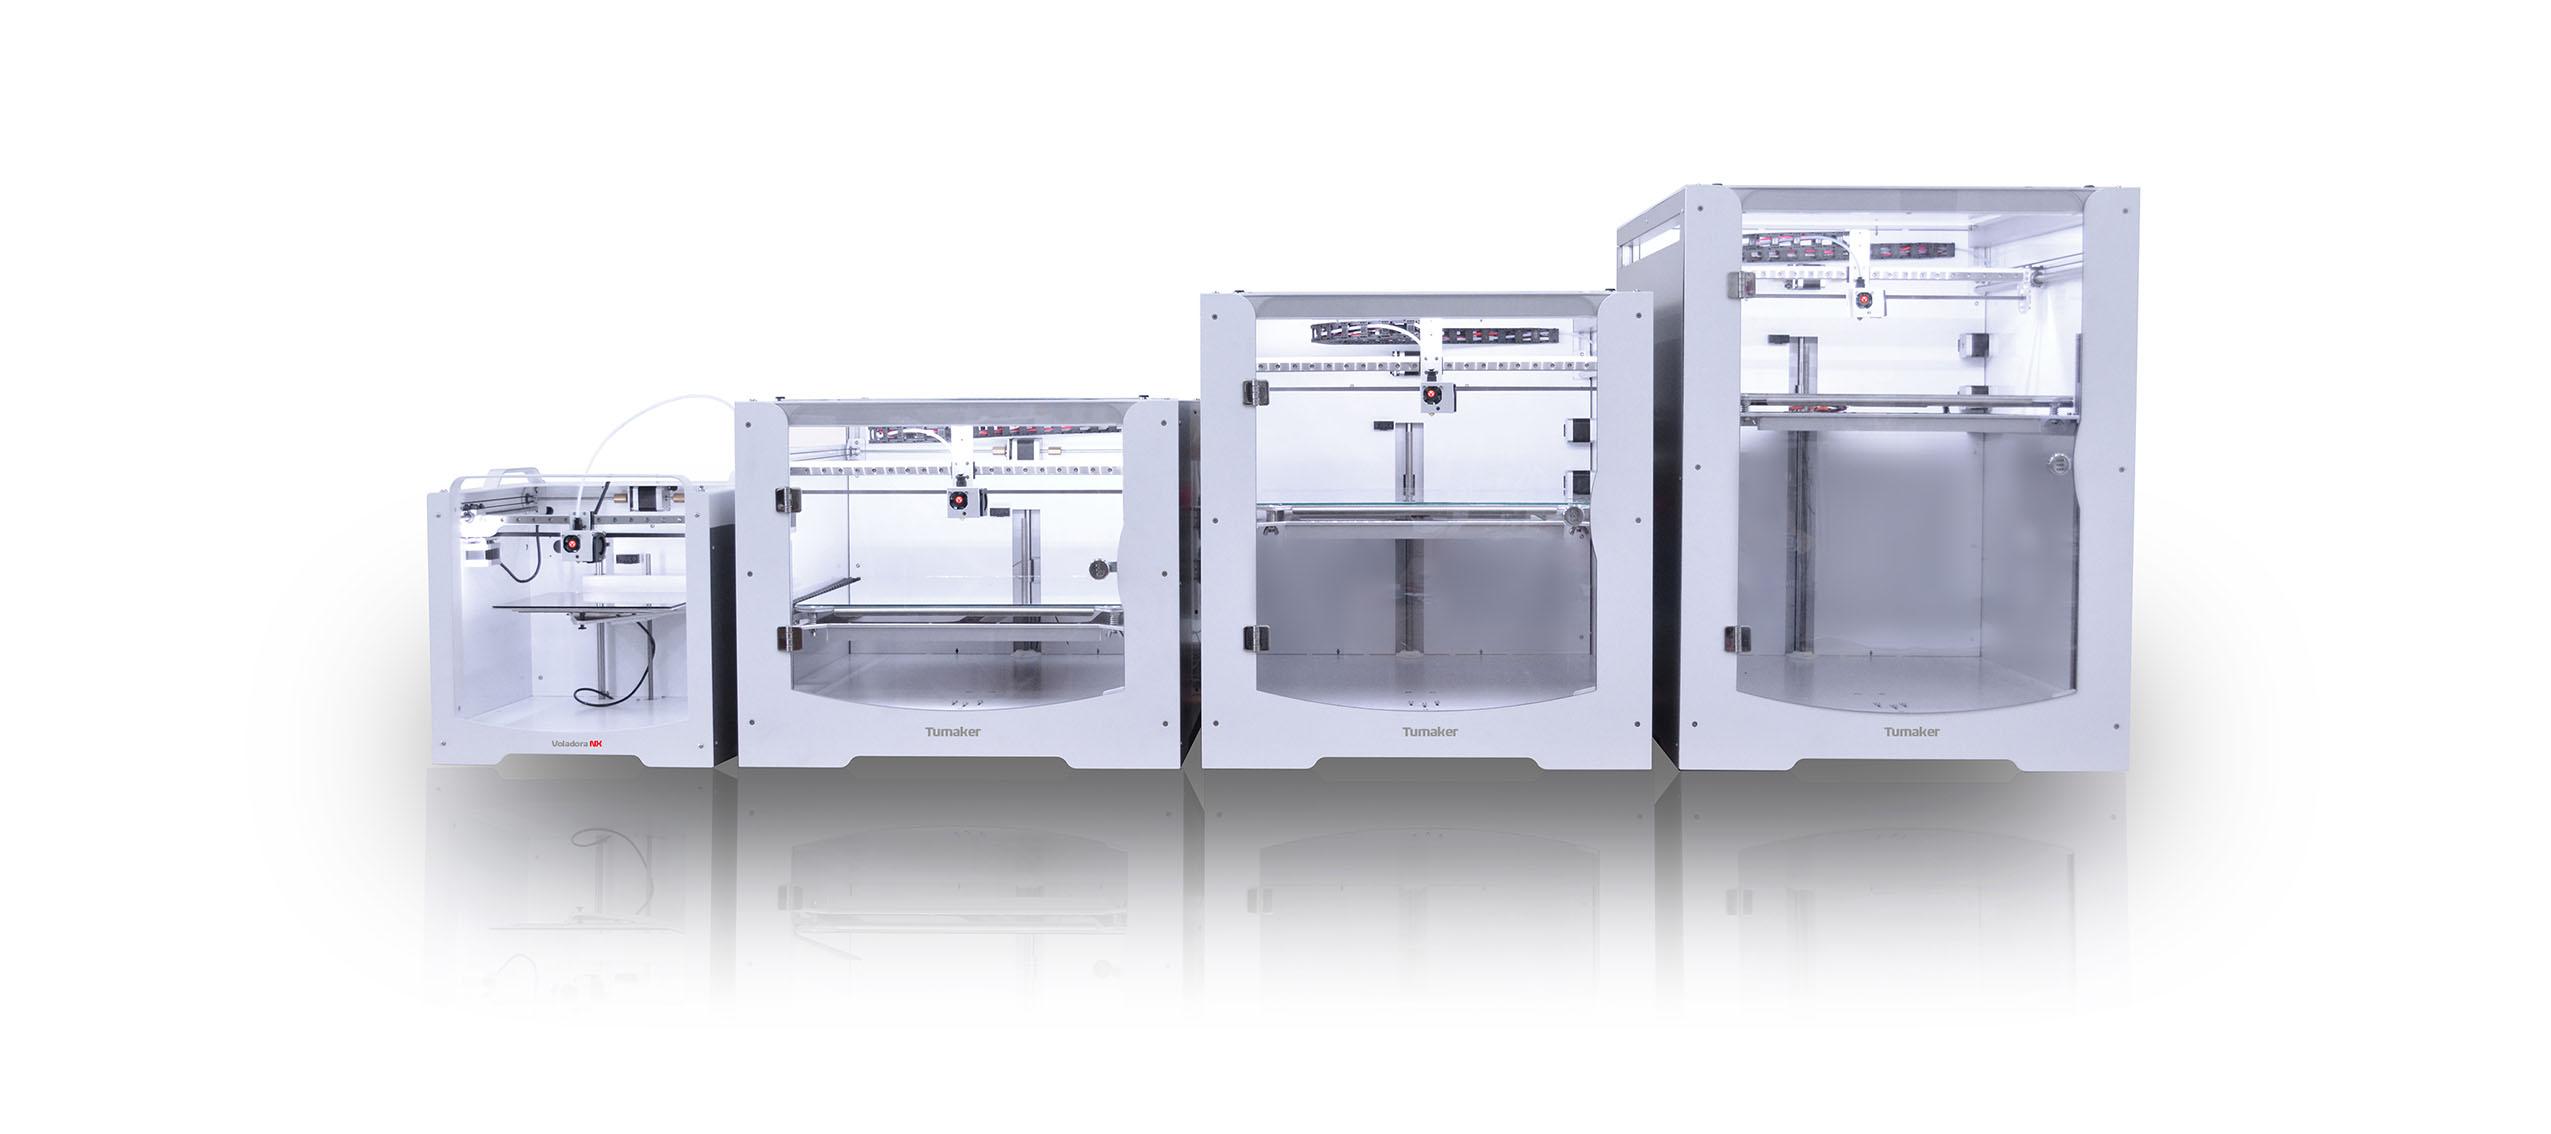 Tumaker presents its latest range of 3D printing stations